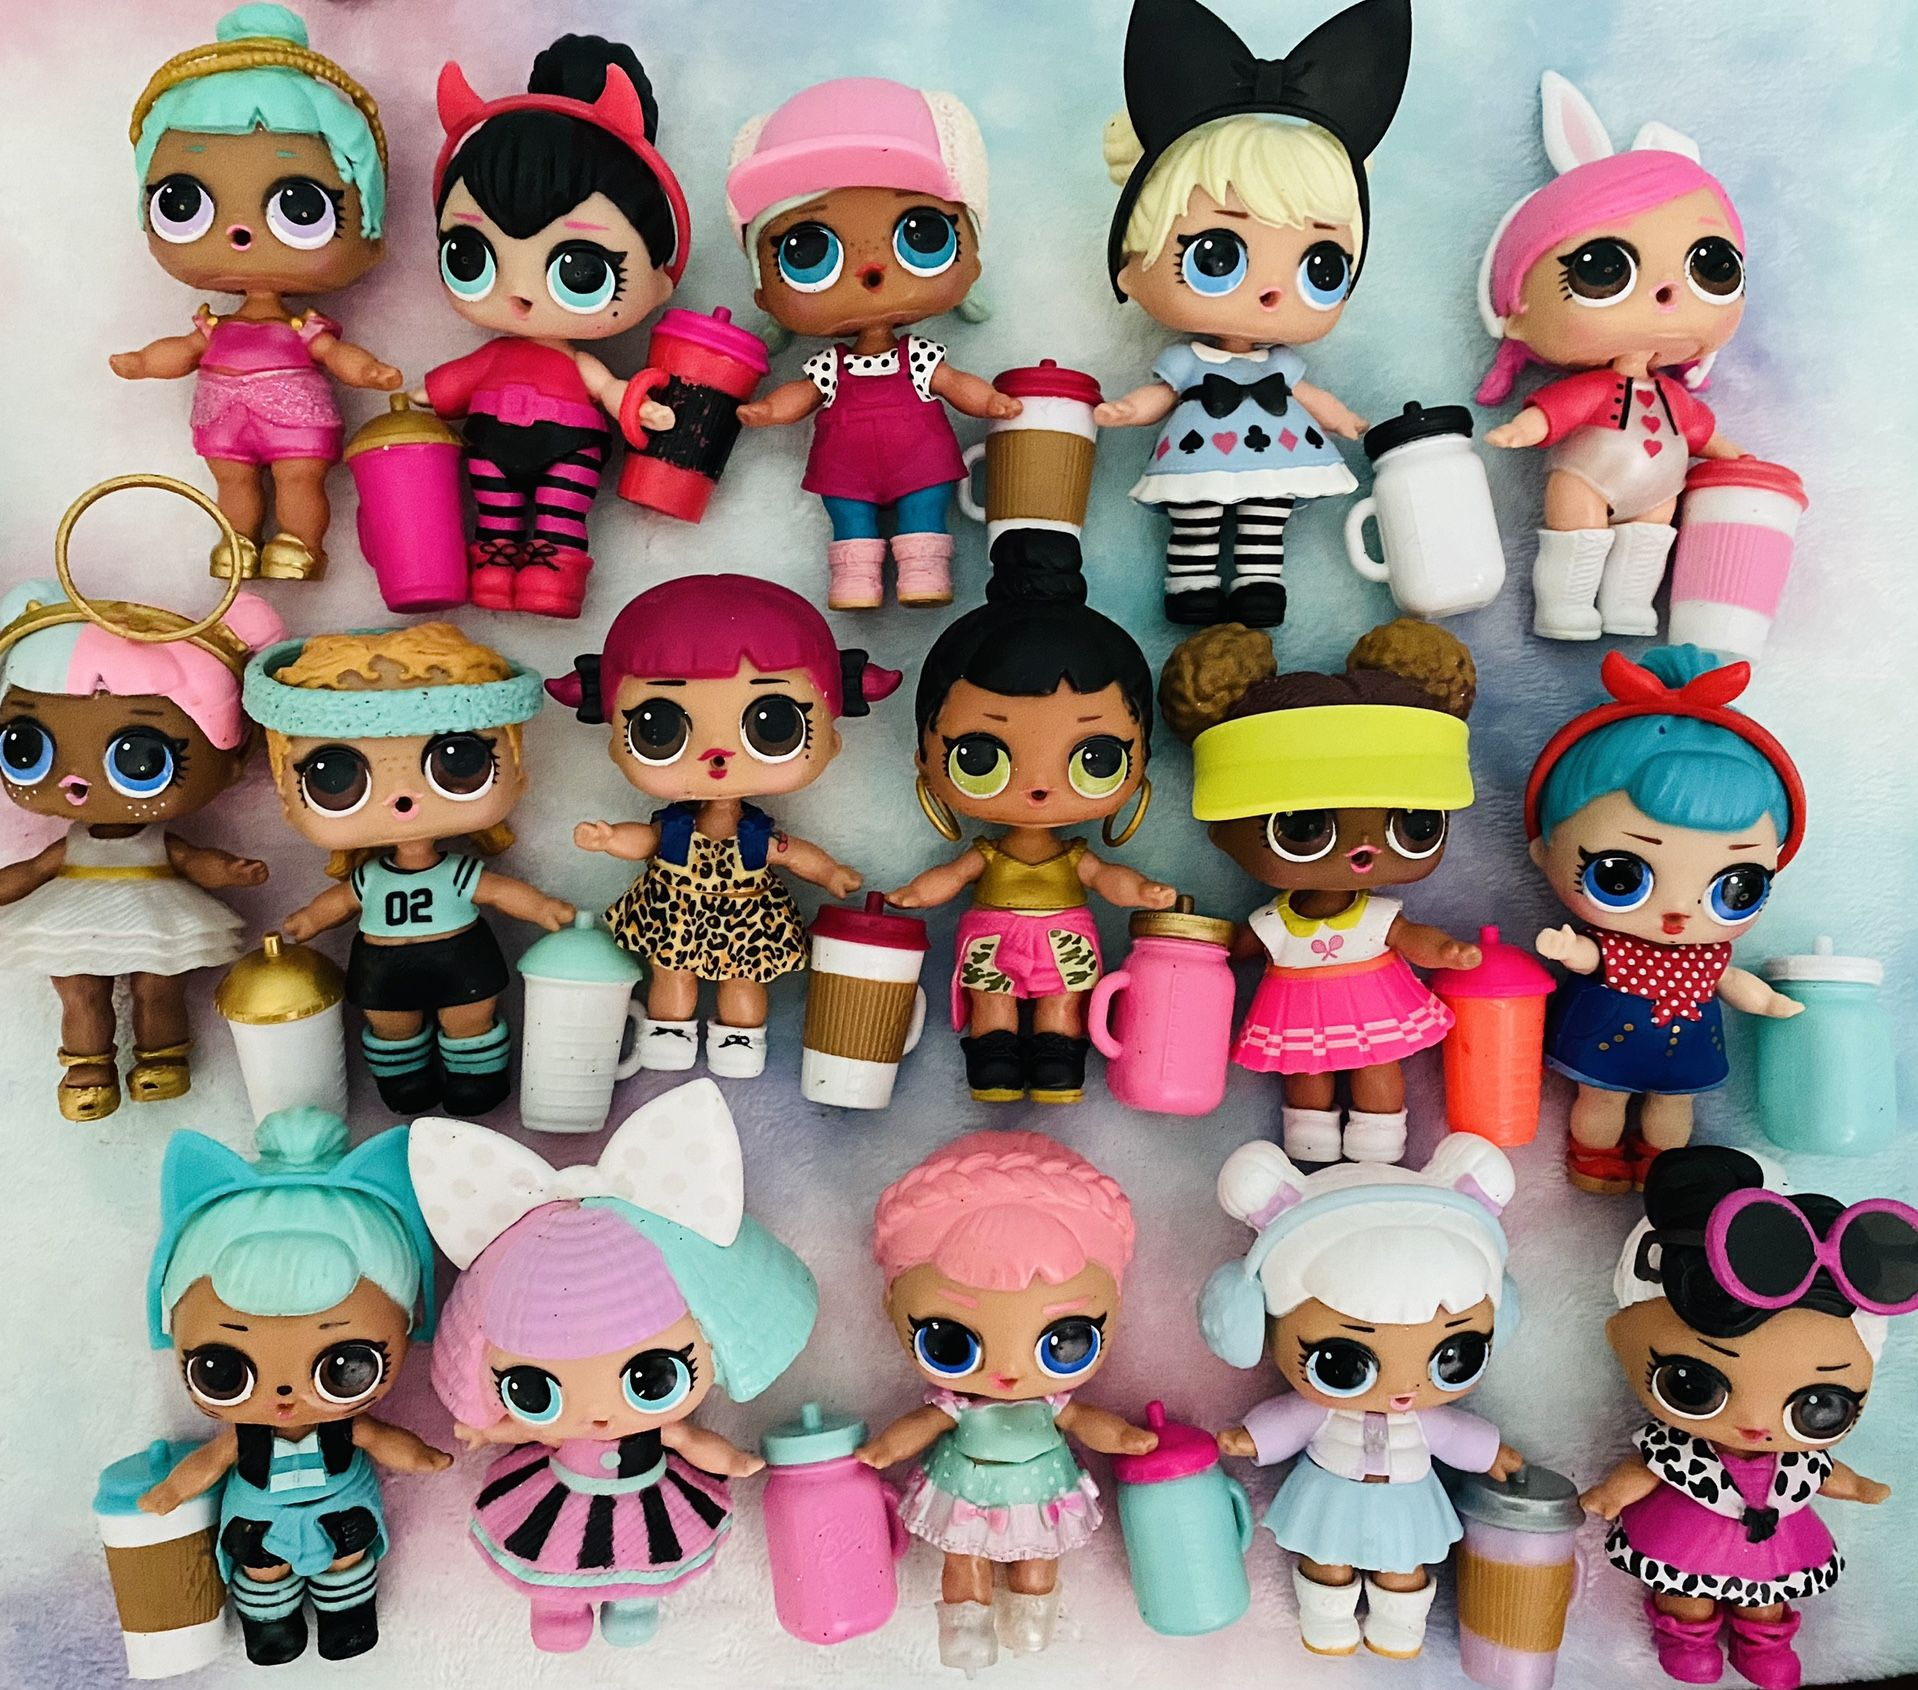 Series 2 Lol Surprise Doll Variety